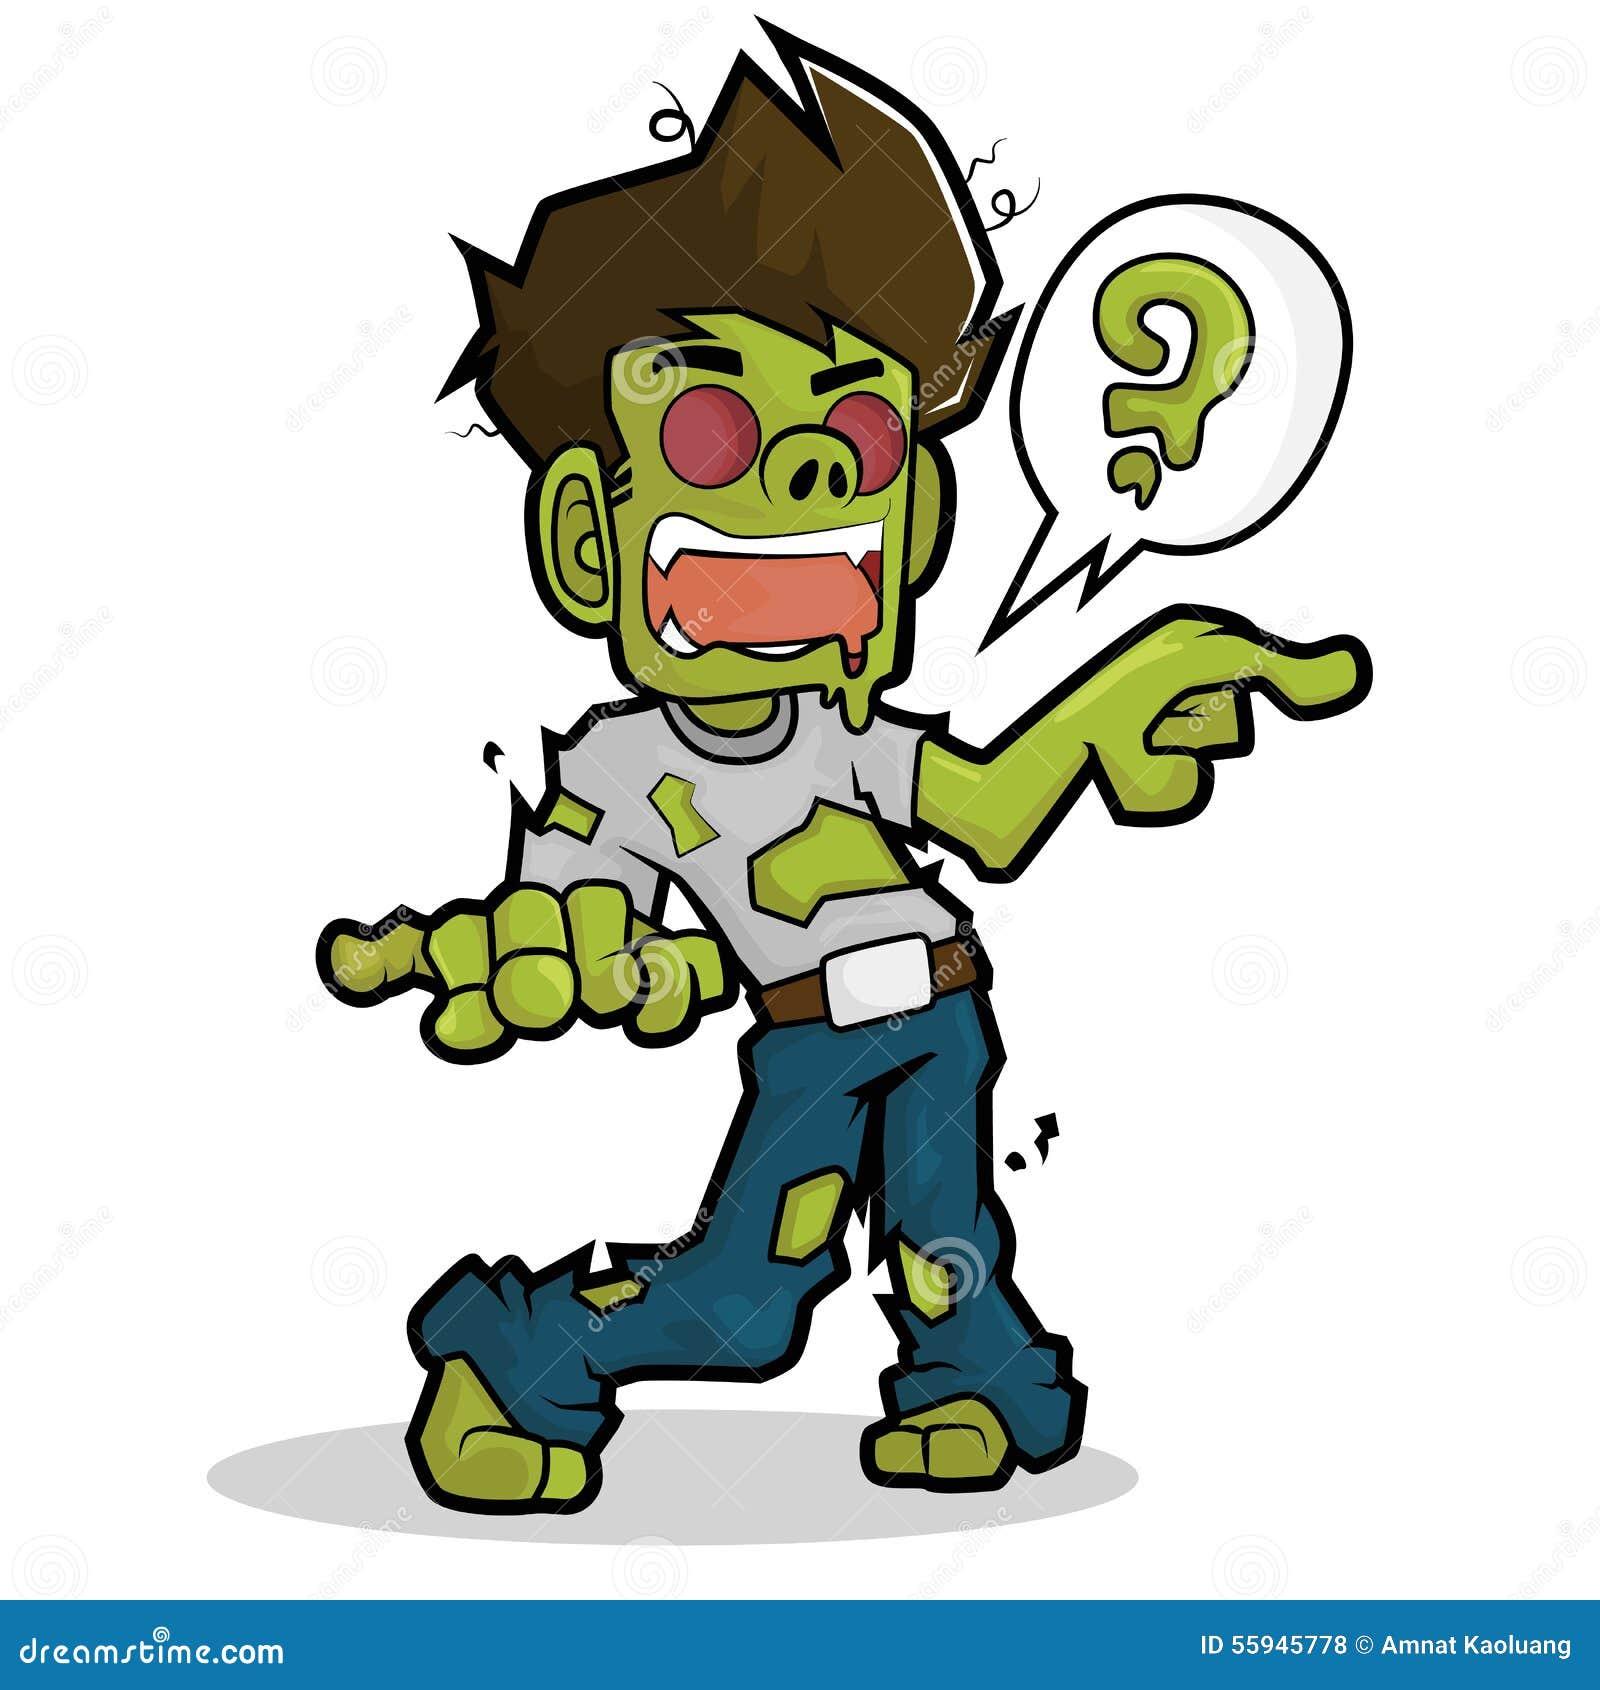 Cartoon Characters Zombies : Zombie cartoon character stock vector illustration of